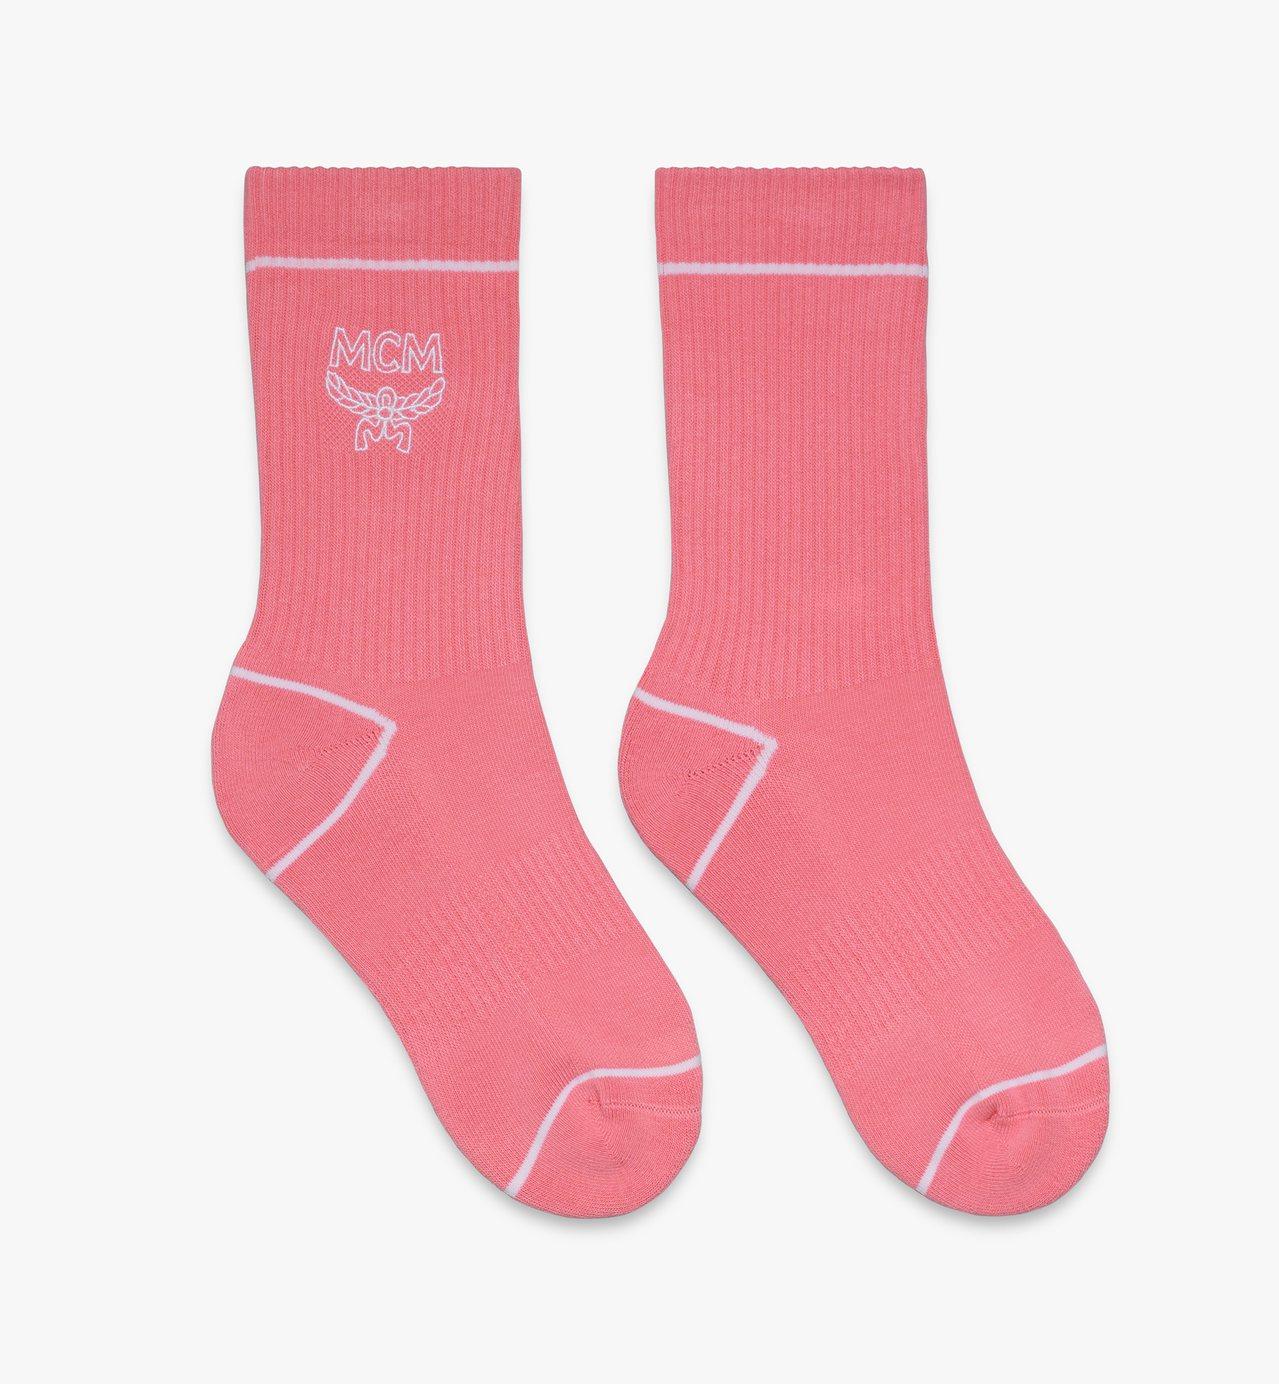 MCMLOGO粉色長襪,售價3,000元。圖/MCM提供